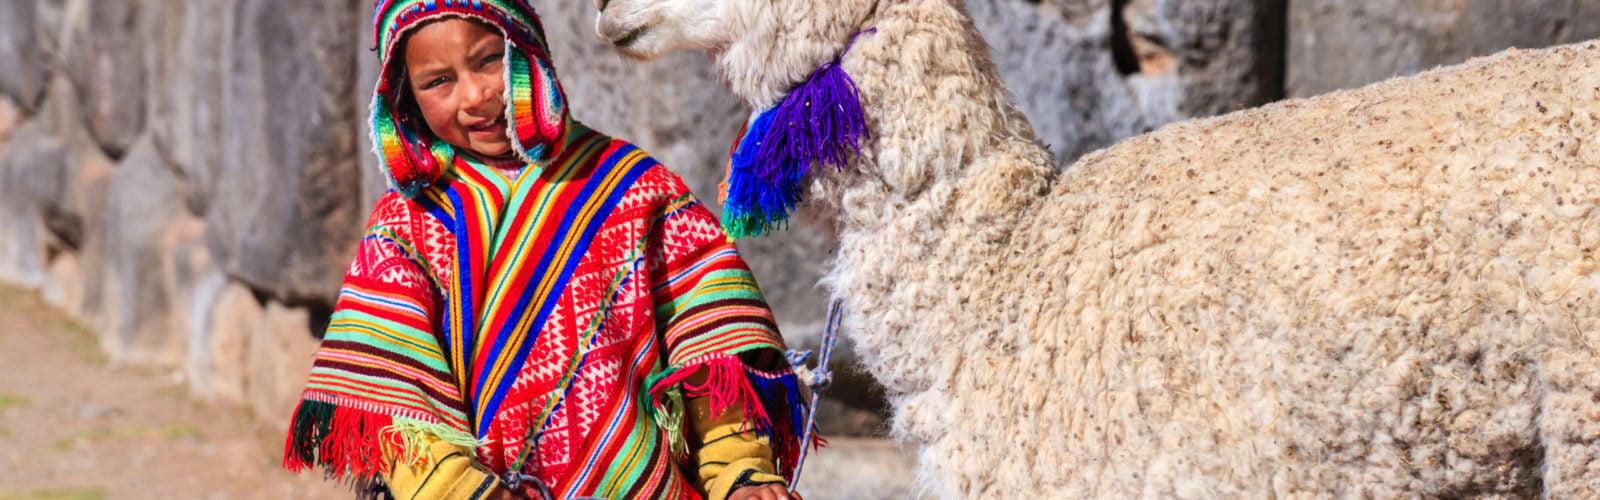 Peruvian little boy wearing national clothing with llama near Cuzco, Peru